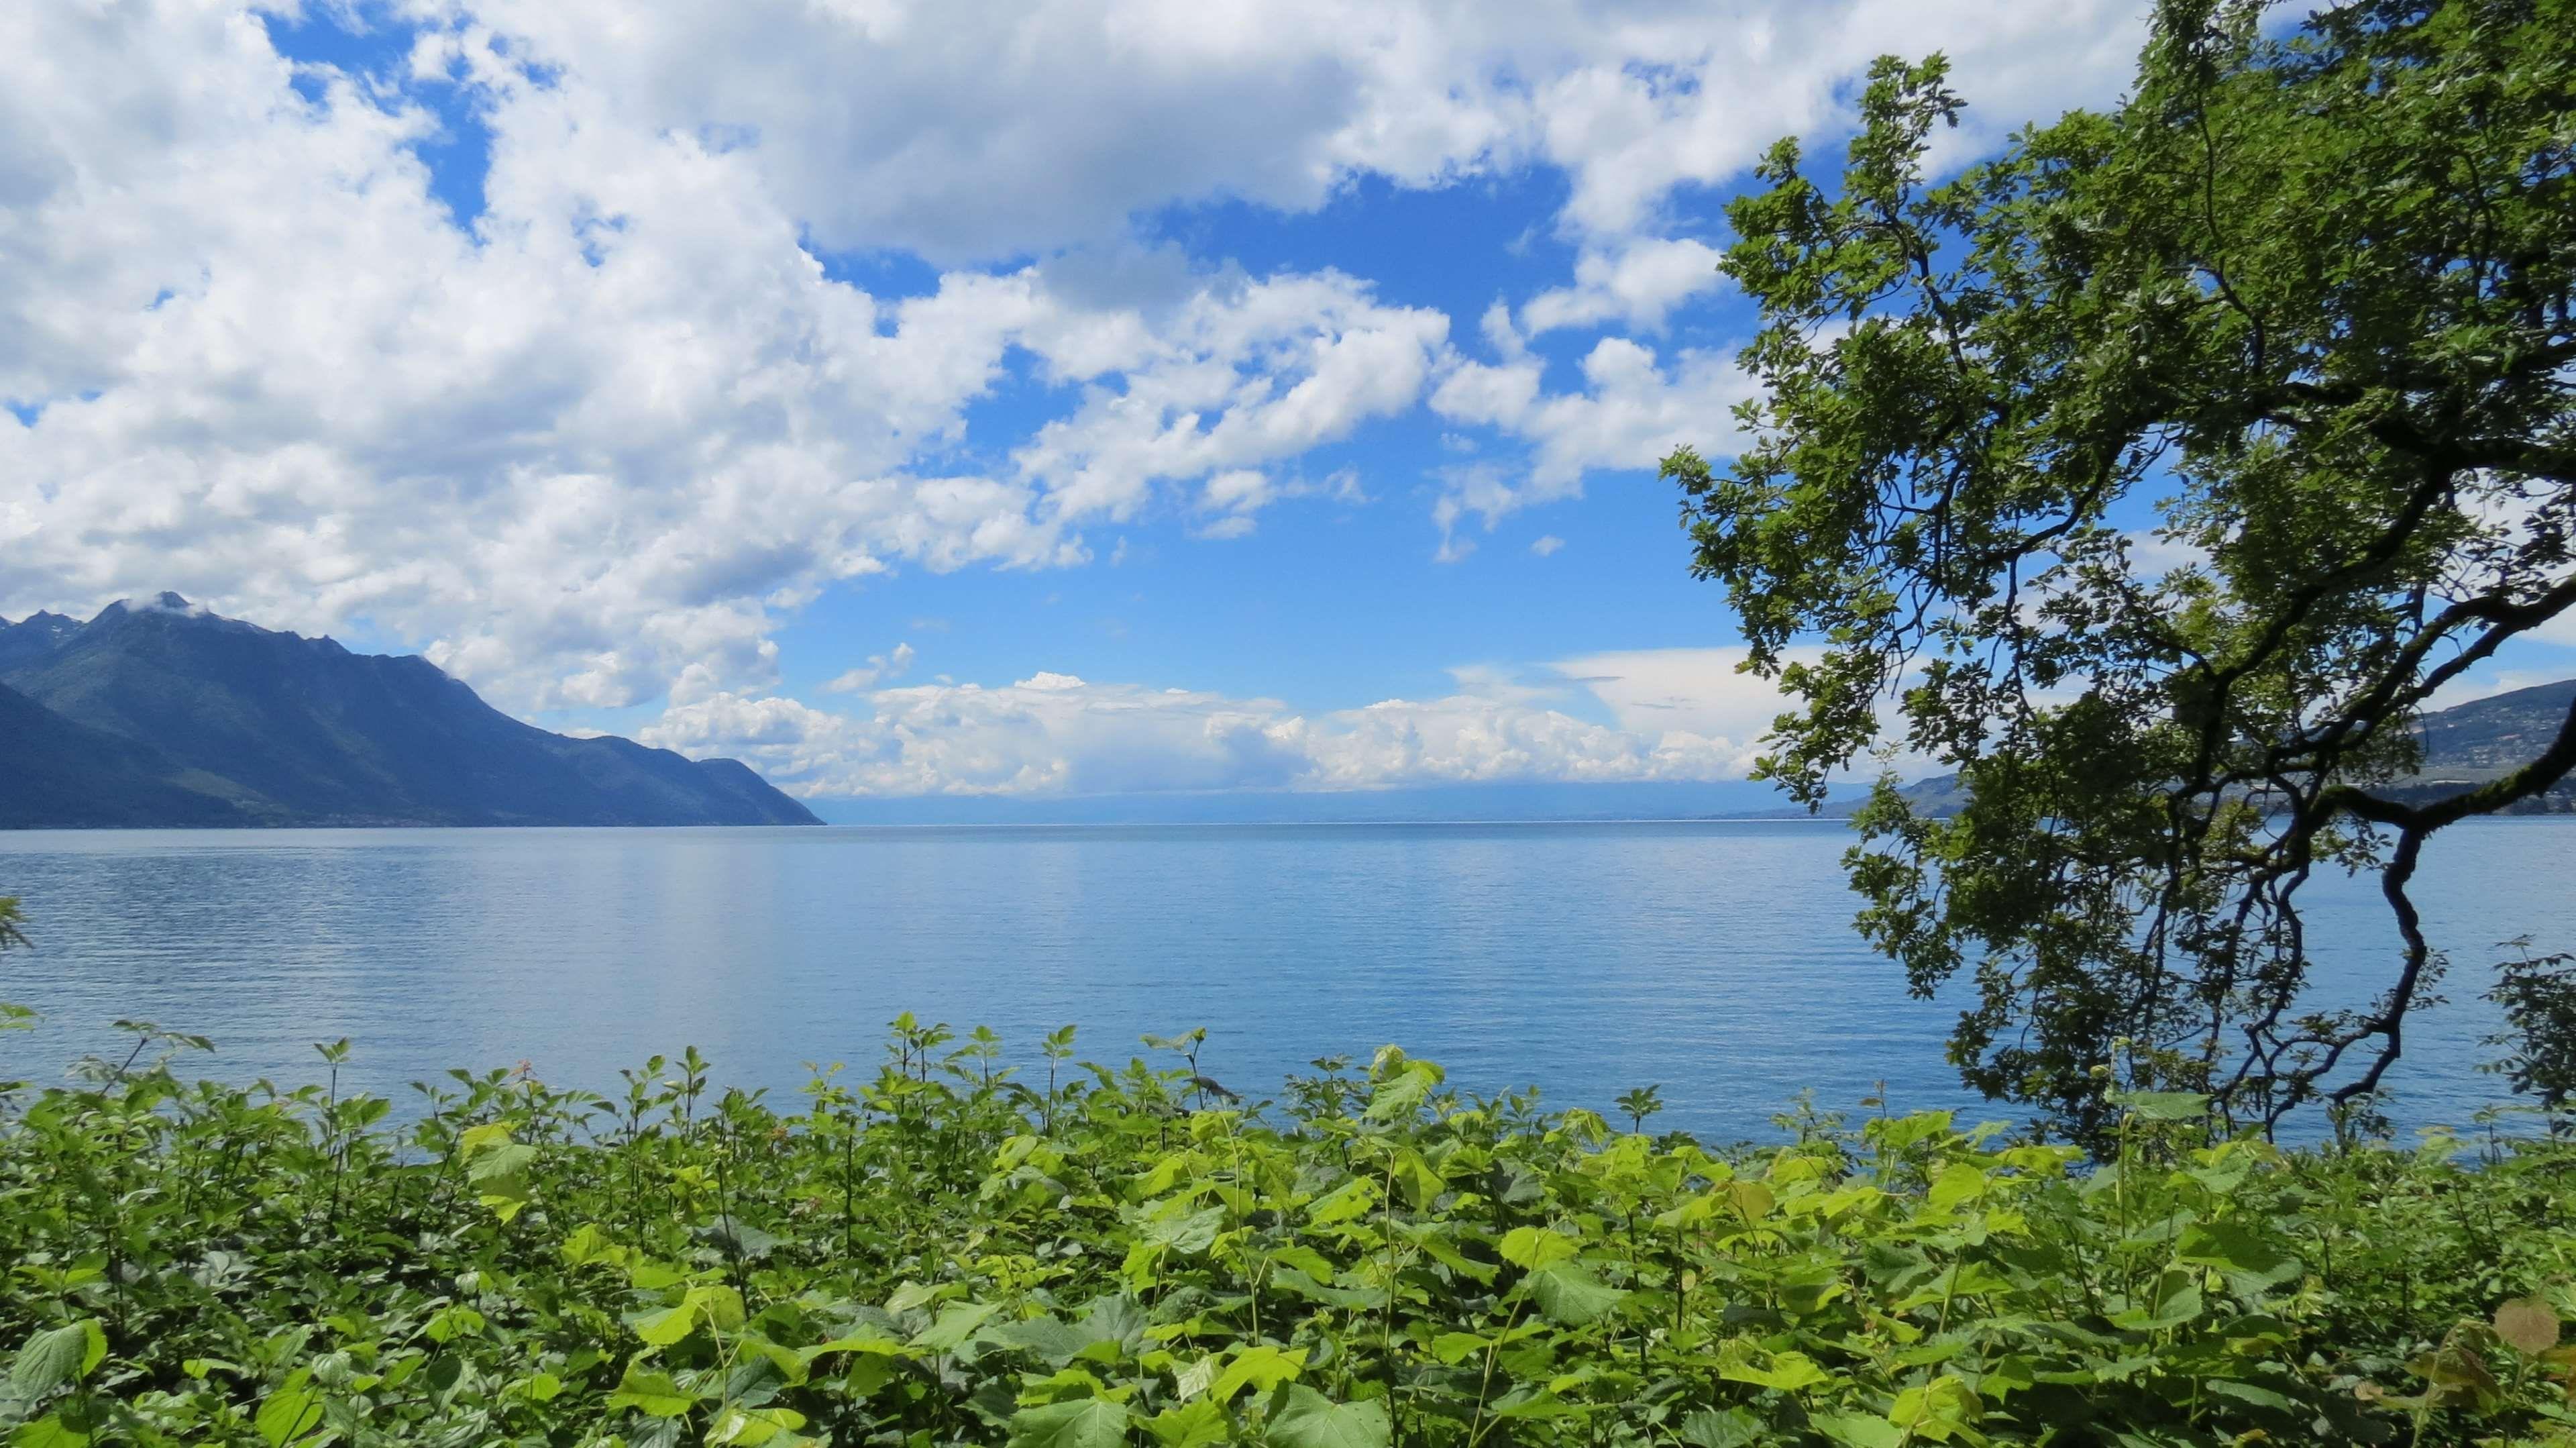 Alps Blue Calm Clouds Europe European Geneva Green Happy Lac Leman Lake Lake Geneva Land Beautiful Vacation Spots Cool Places To Visit Lake Geneva